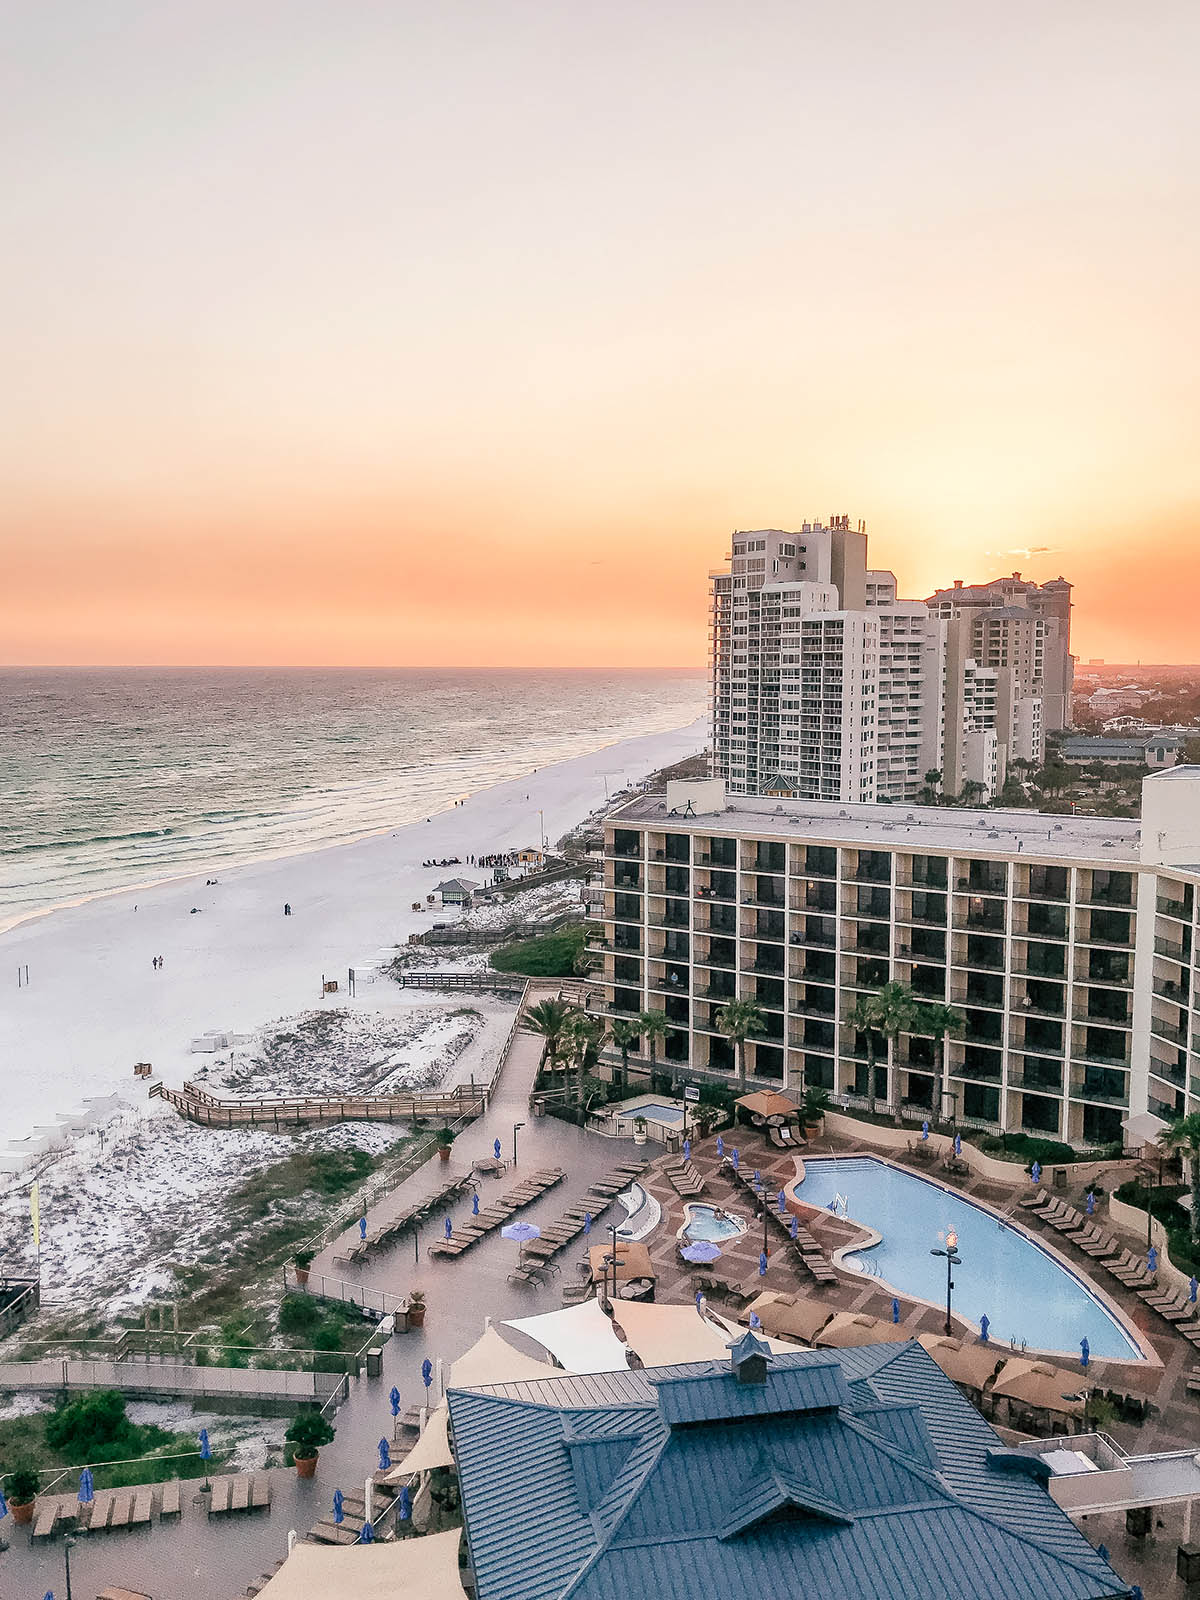 Sandestin Travel Guide | Sandestin Hilton | Sandestin Beach